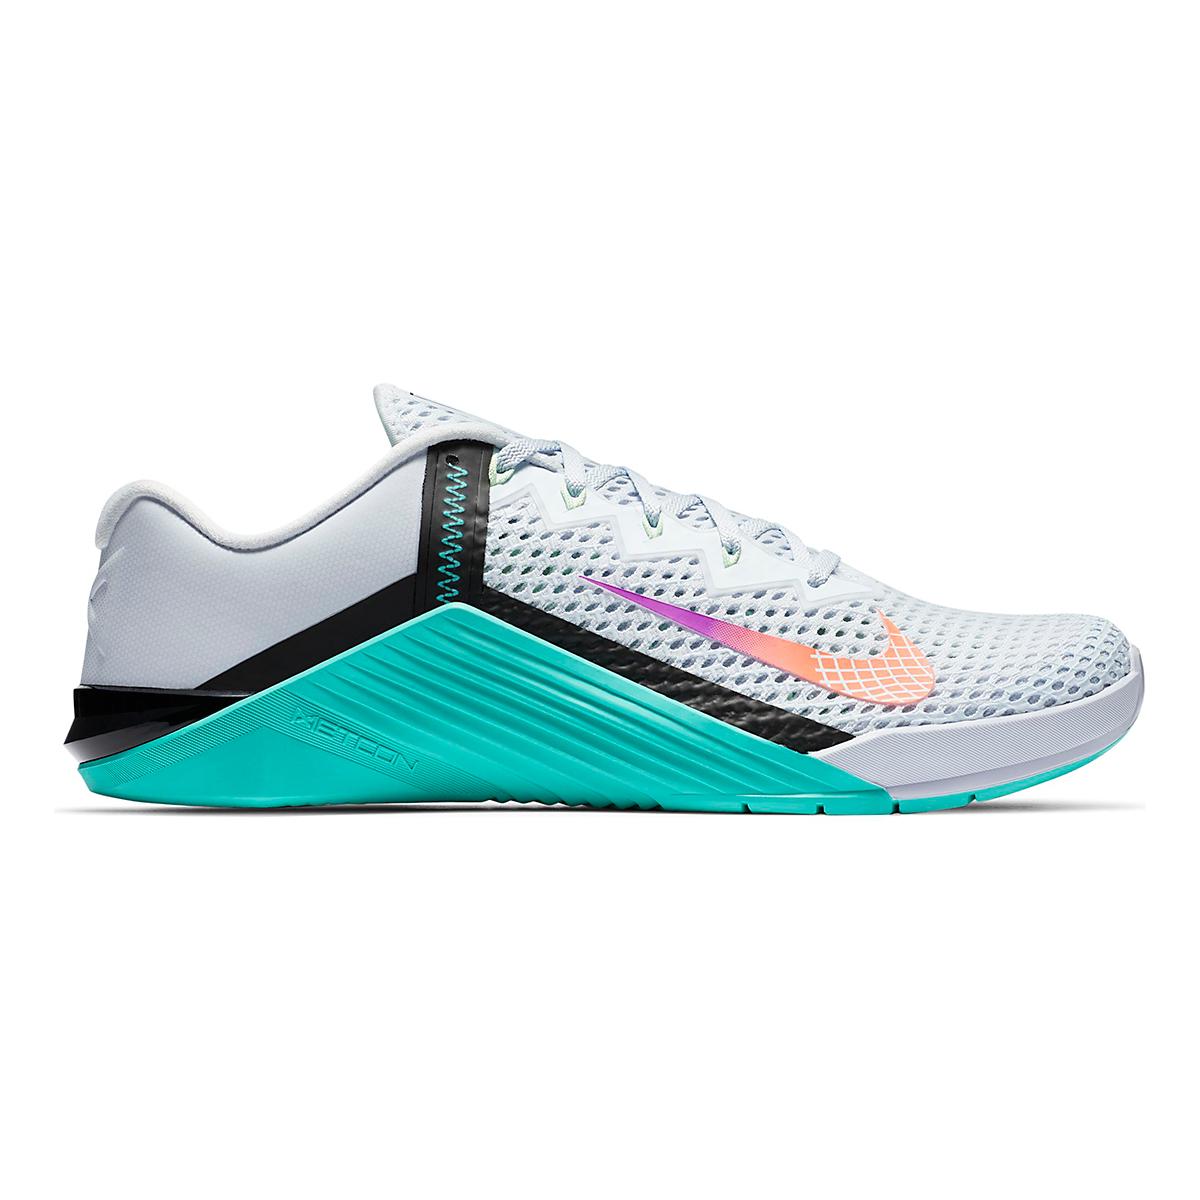 Men's Nike Nike Metcon 6 Training Shoes - Color: Football Grey/Hyper Jade/Black/Flash Crimson - Size: 3.5 - Width: Regular, Football Grey/Hyper Jade/Black/Flash Crimson, large, image 1